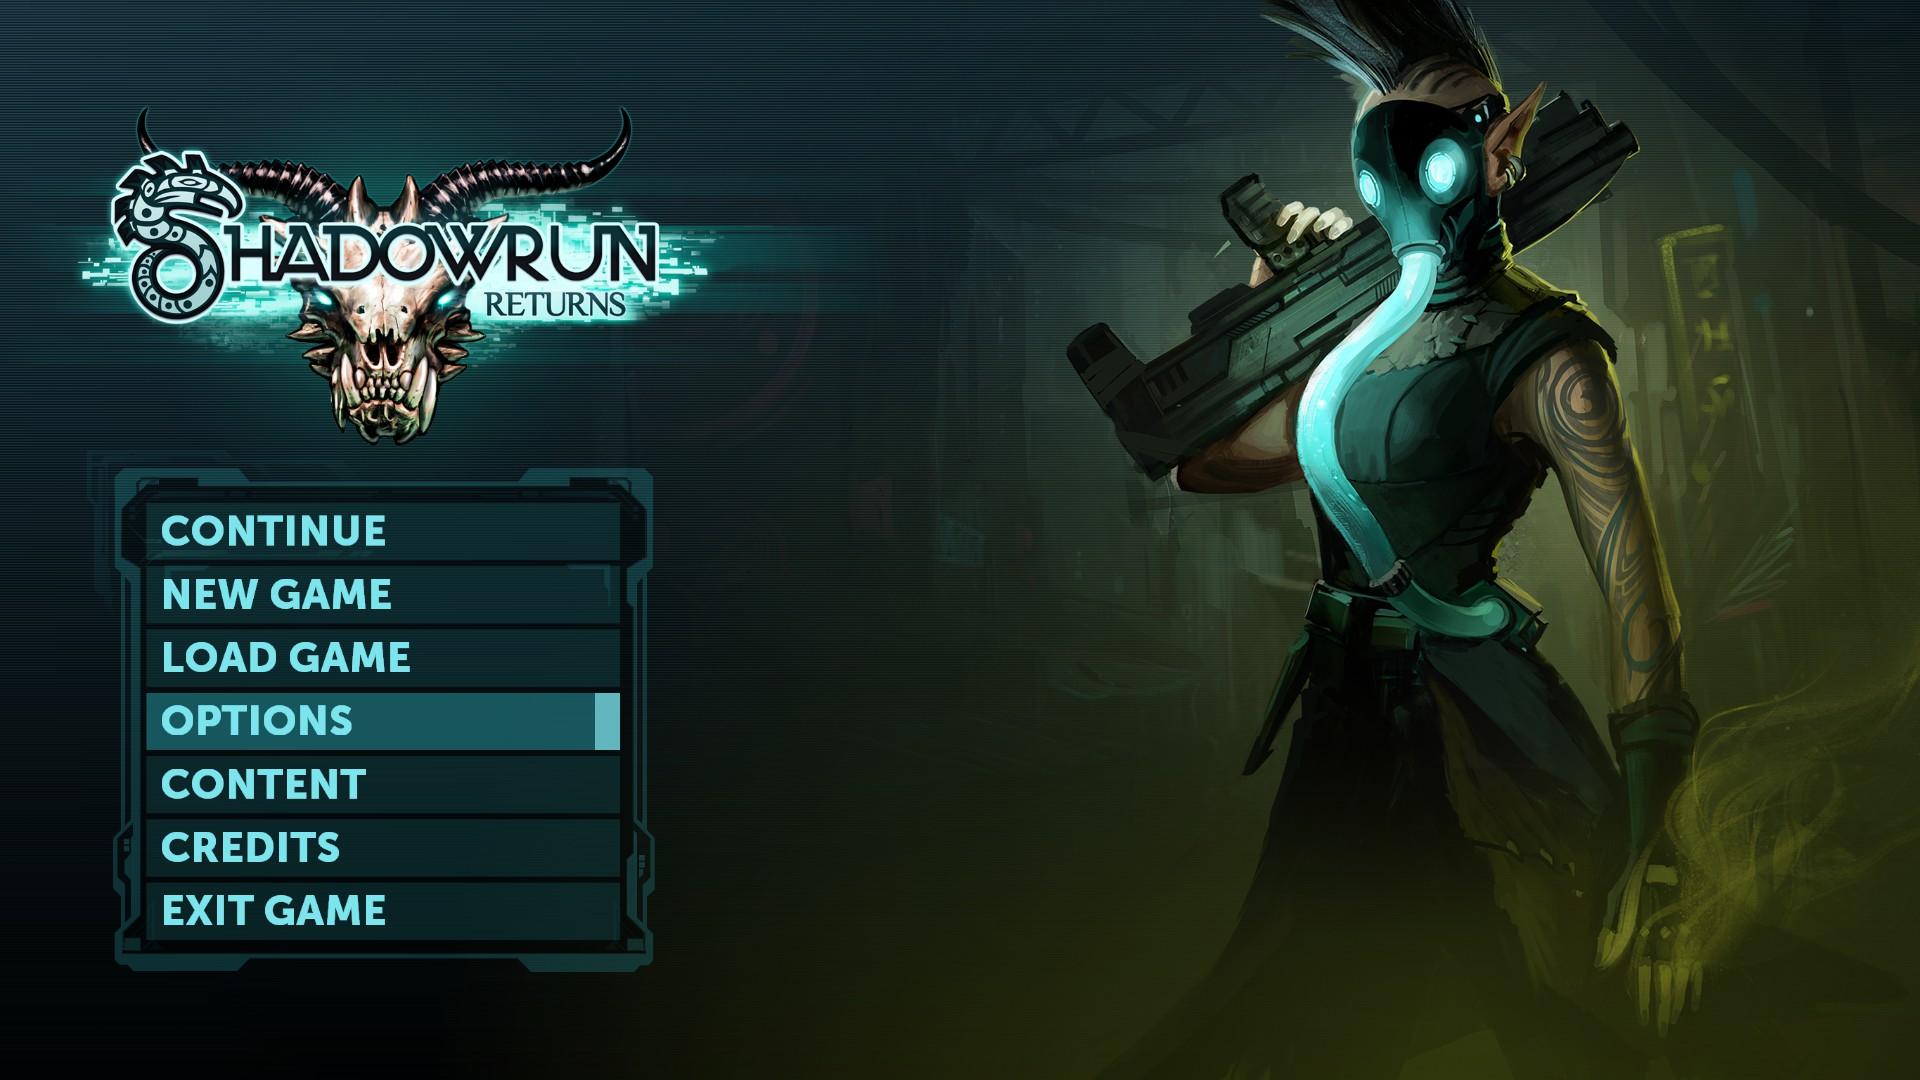 shadowrun redeem code roblox